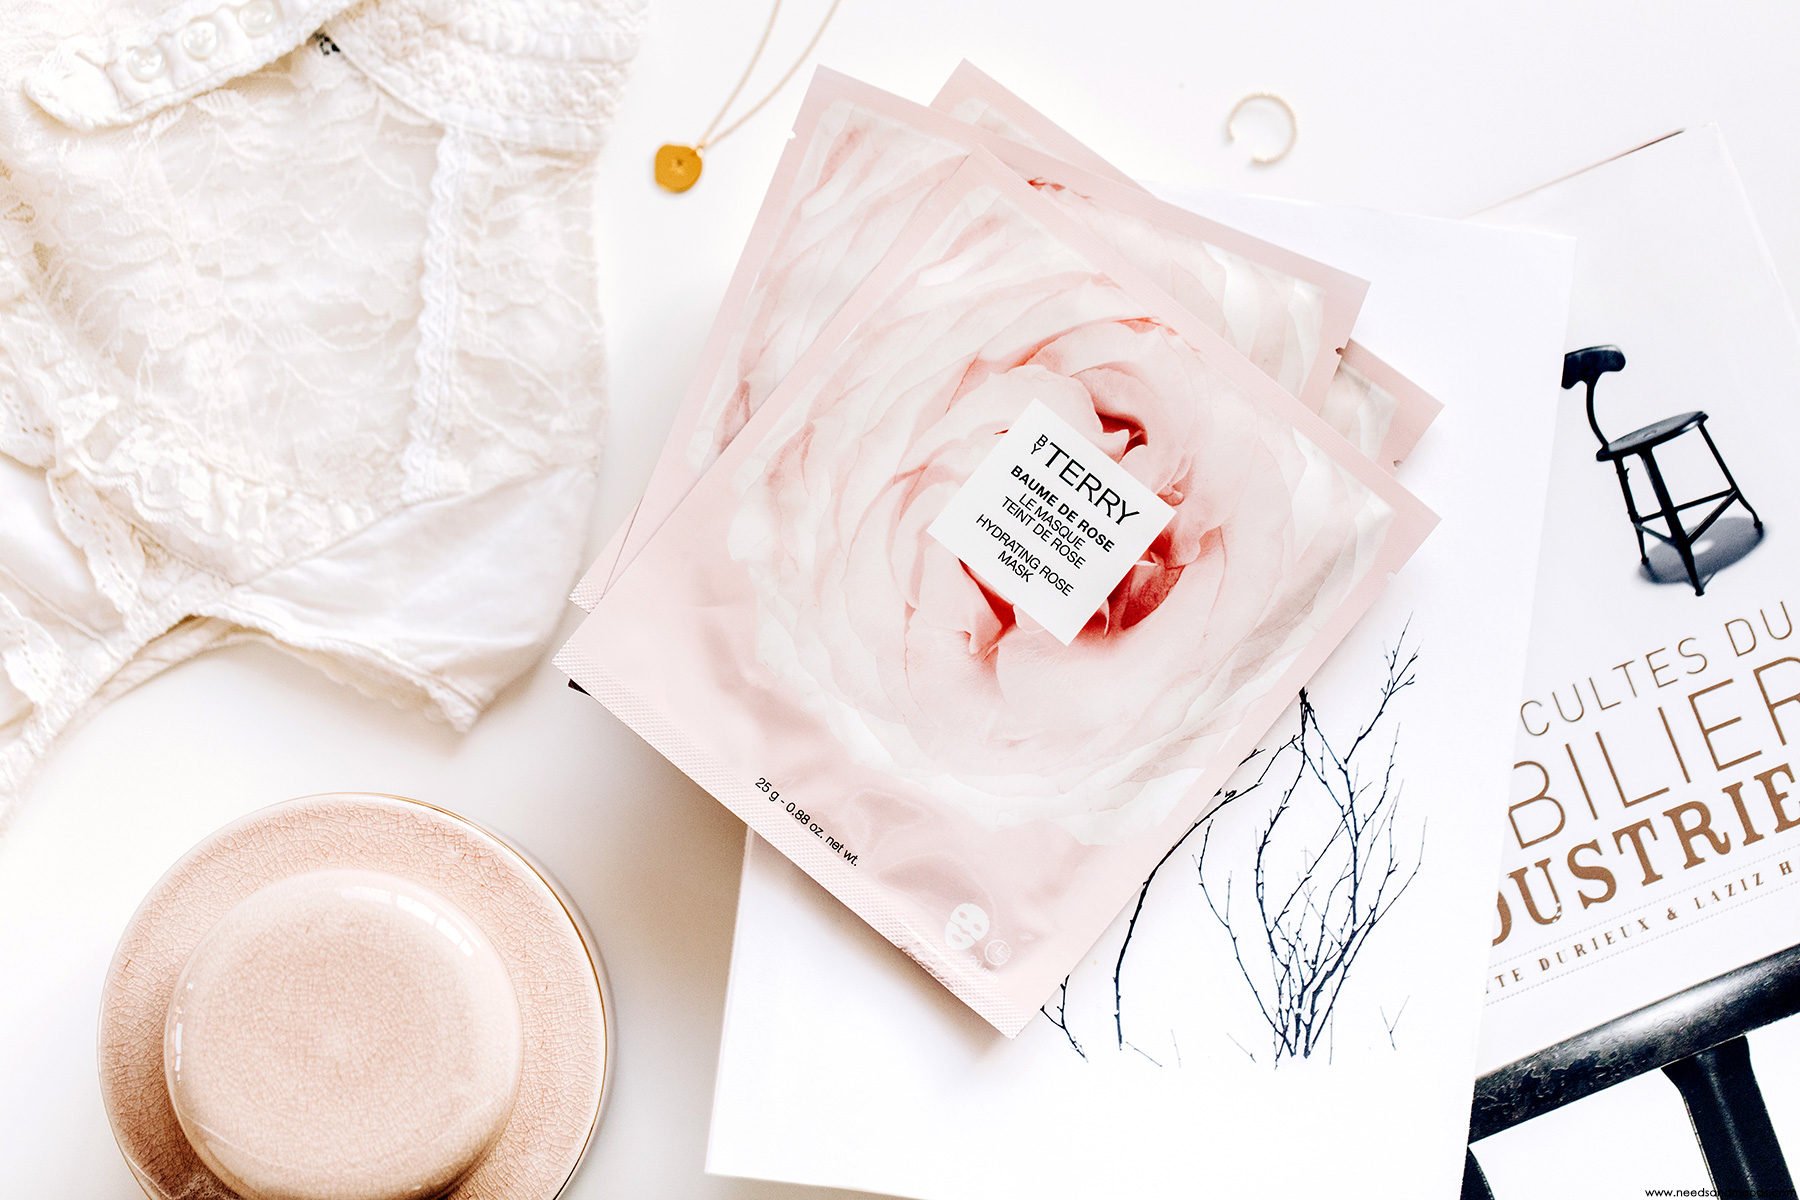 by terry baume de rose masque teint avis